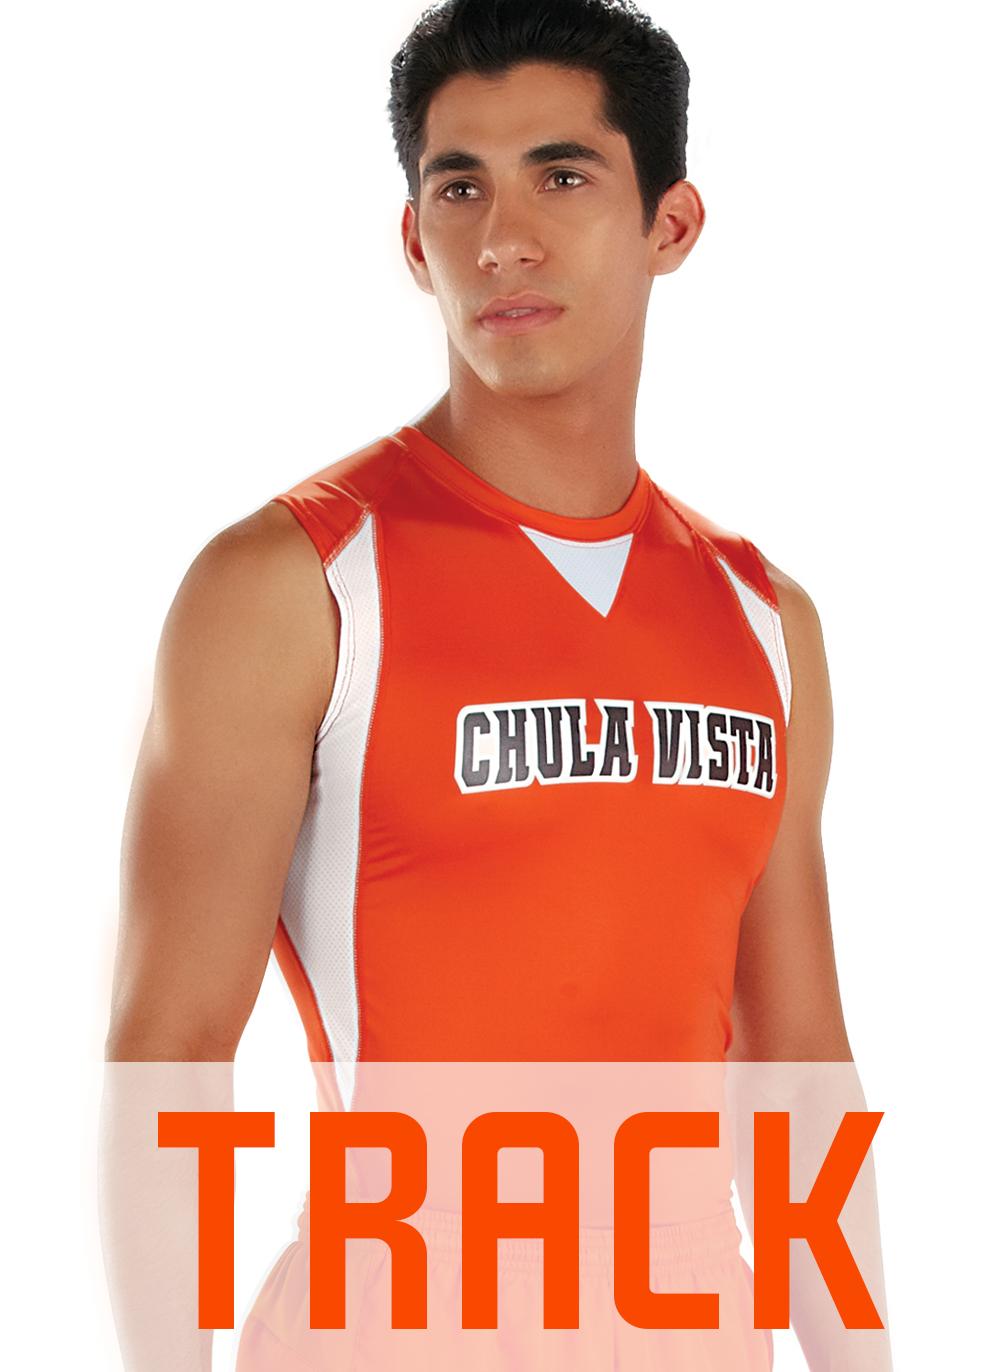 Track Uniforms